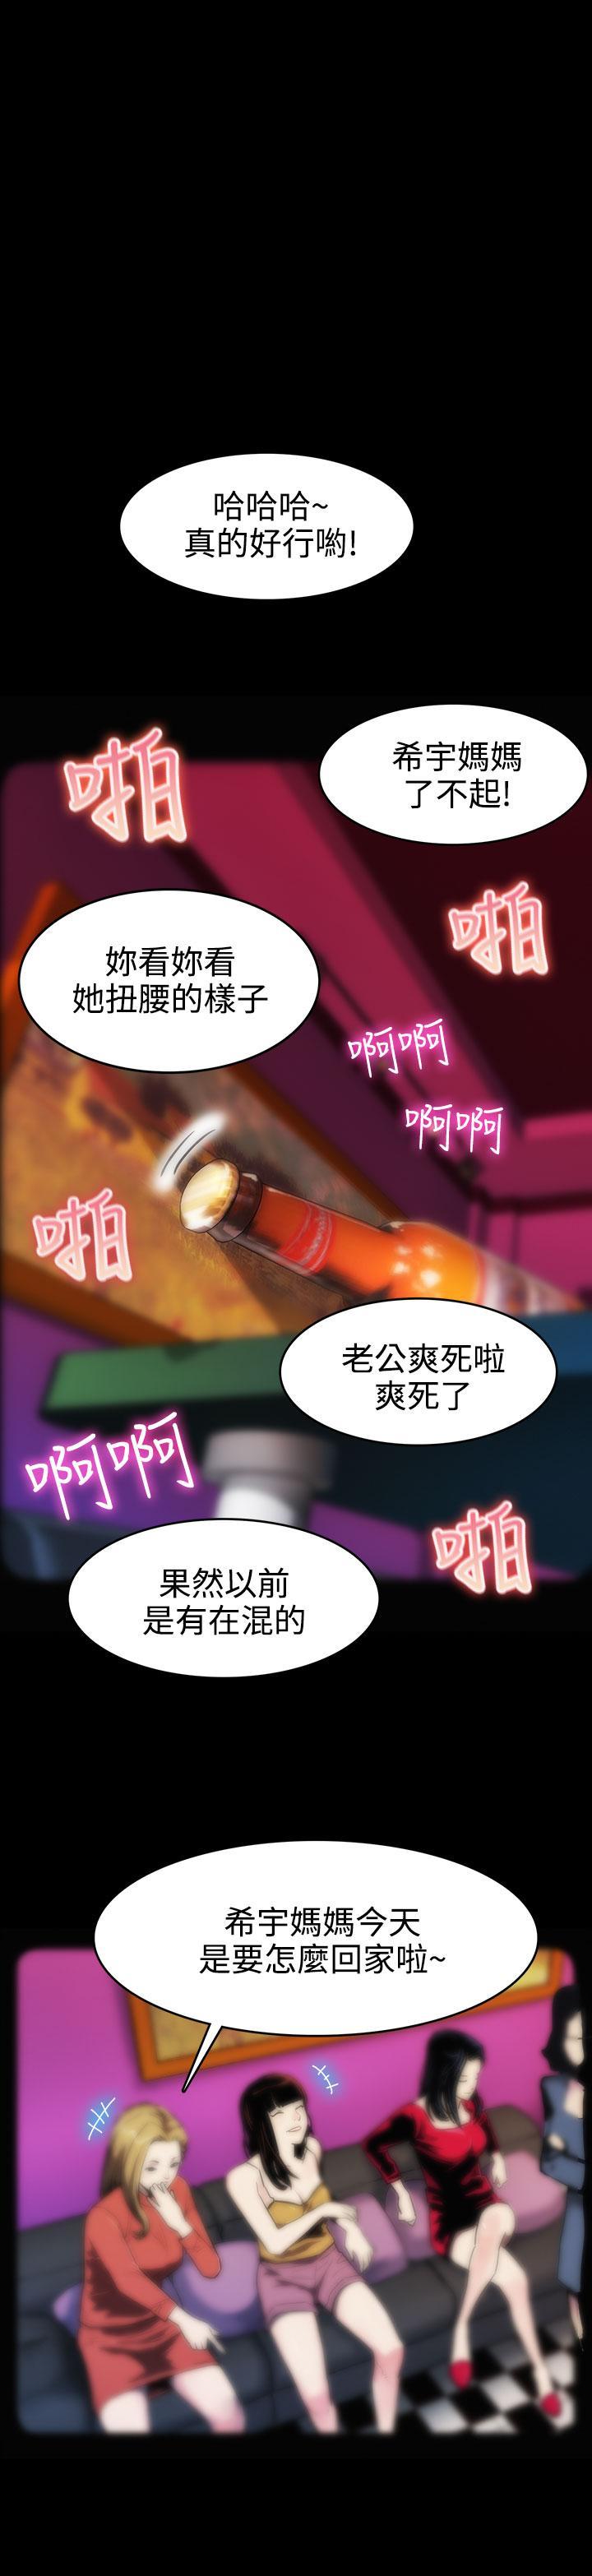 Mom cafe 第1話 [Chinese]中文 10